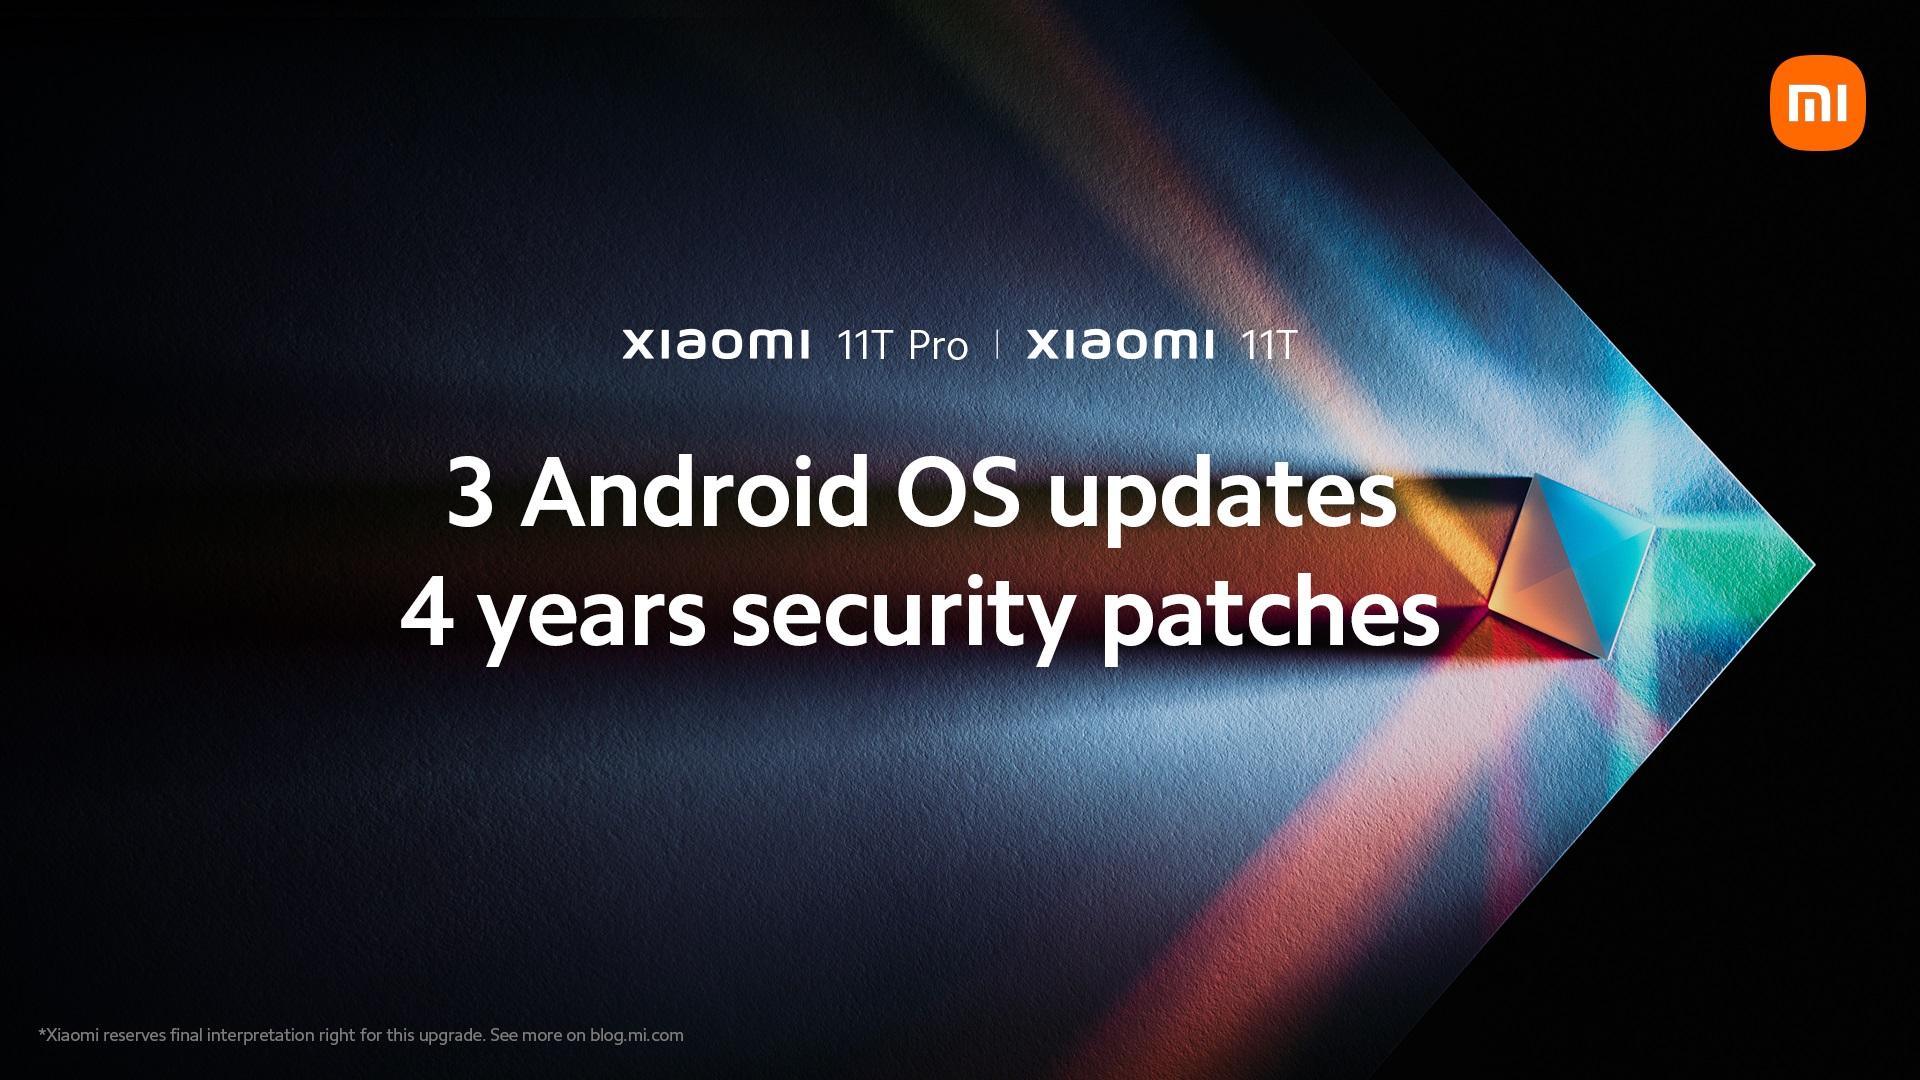 Xiaomi 11T Pro aktualizacje do czterech lat